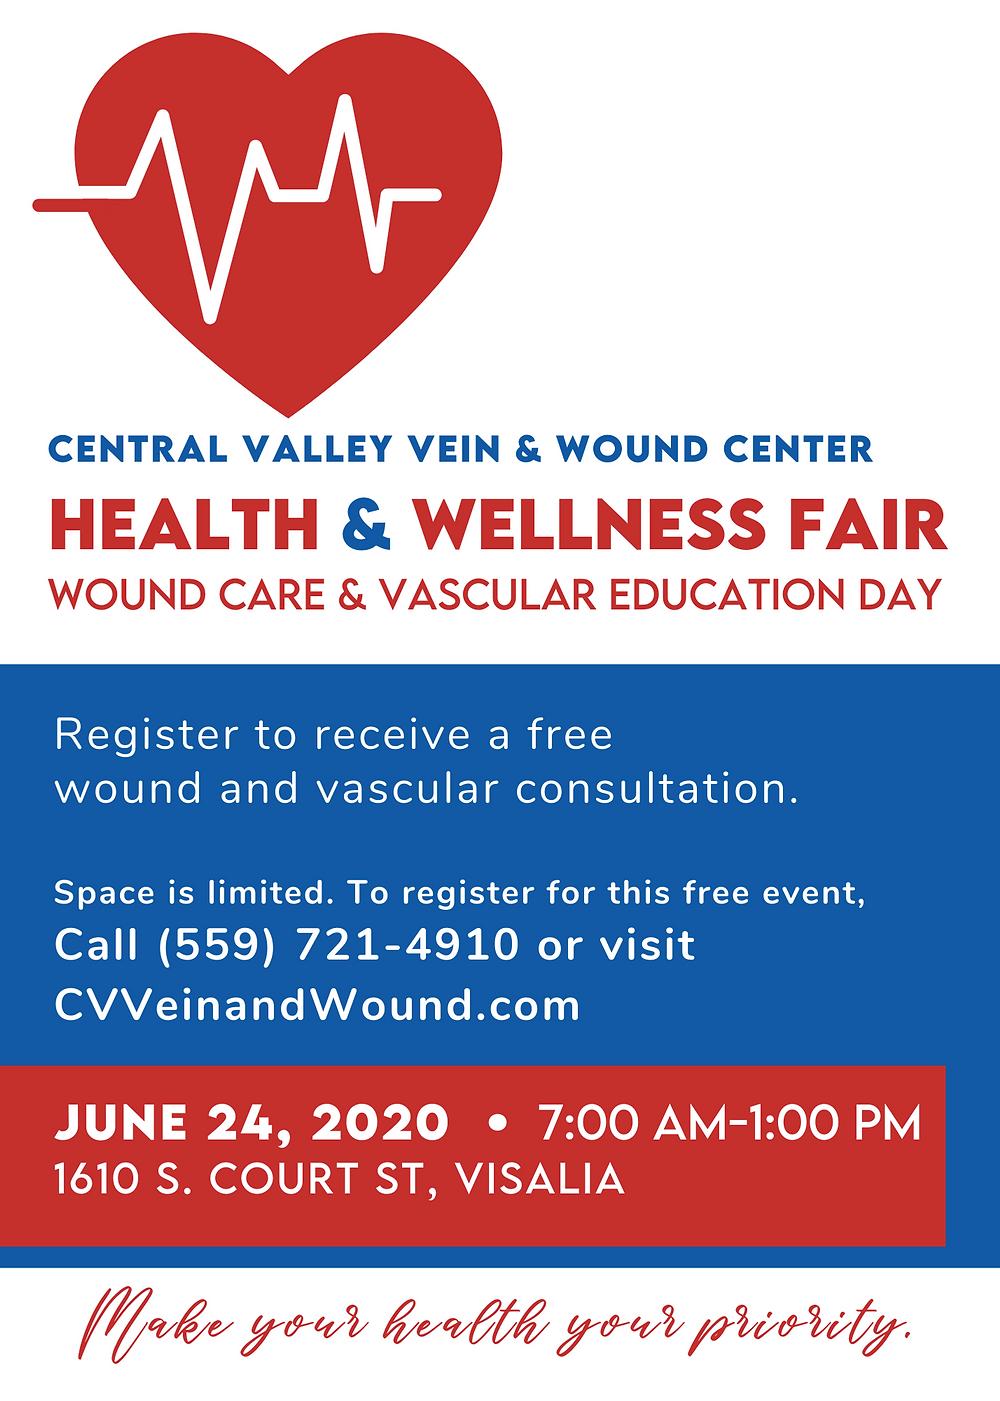 Visalia Health & Wellness Fair: Free Leg Wound Screening